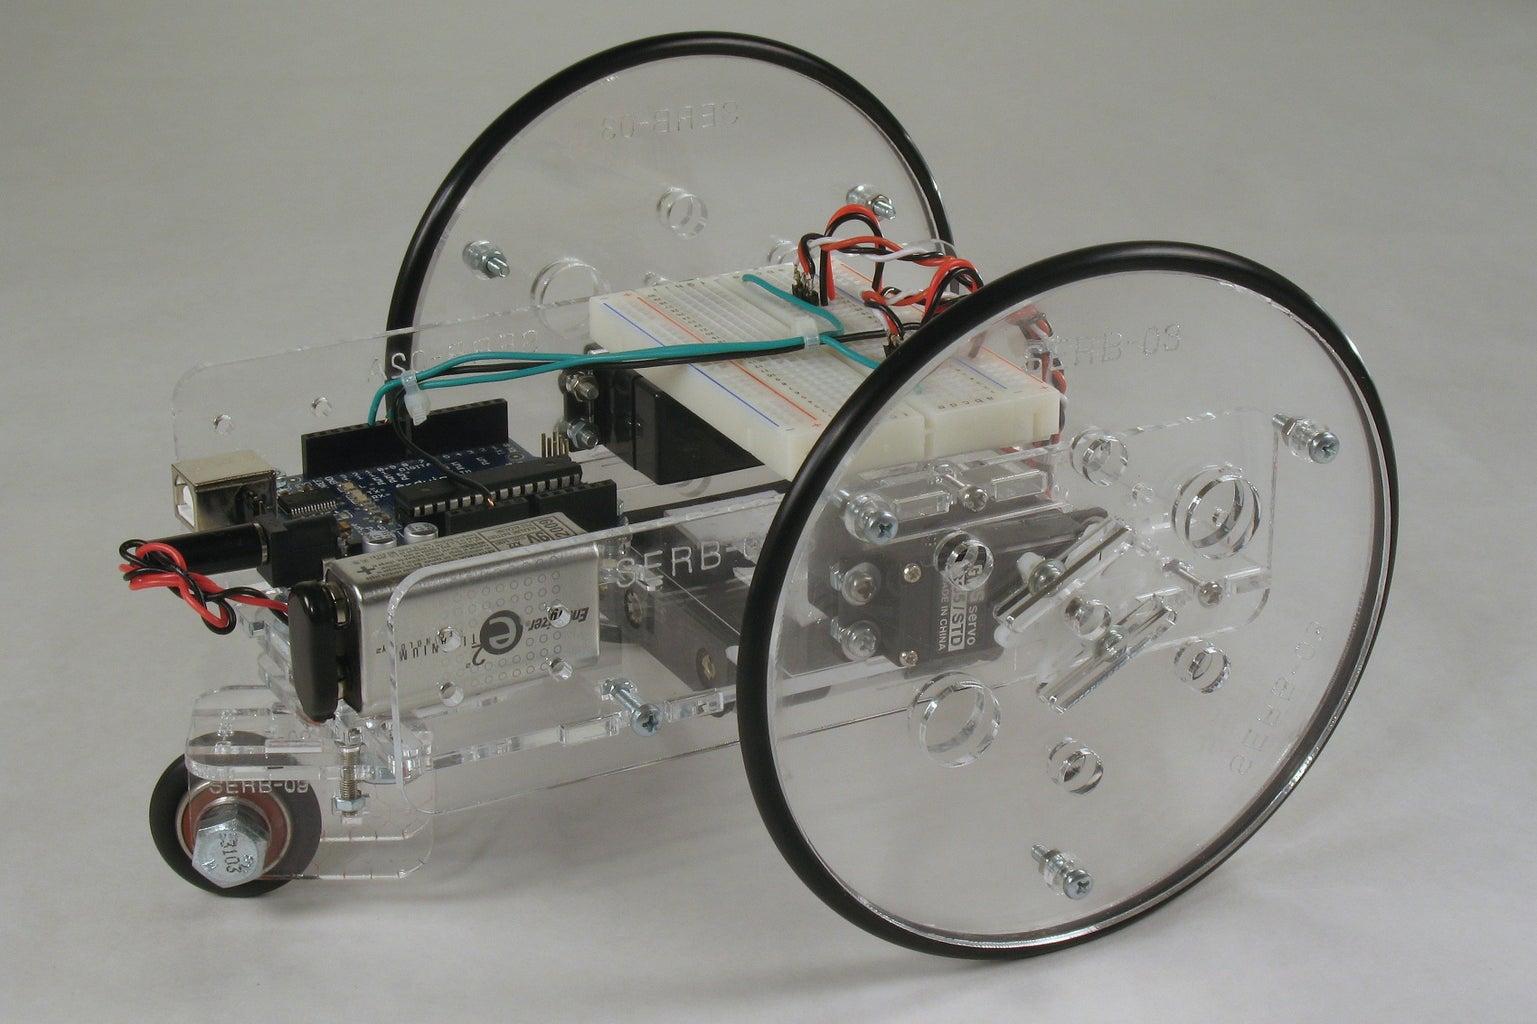 Arduino Controlled Servo Robot (SERB)